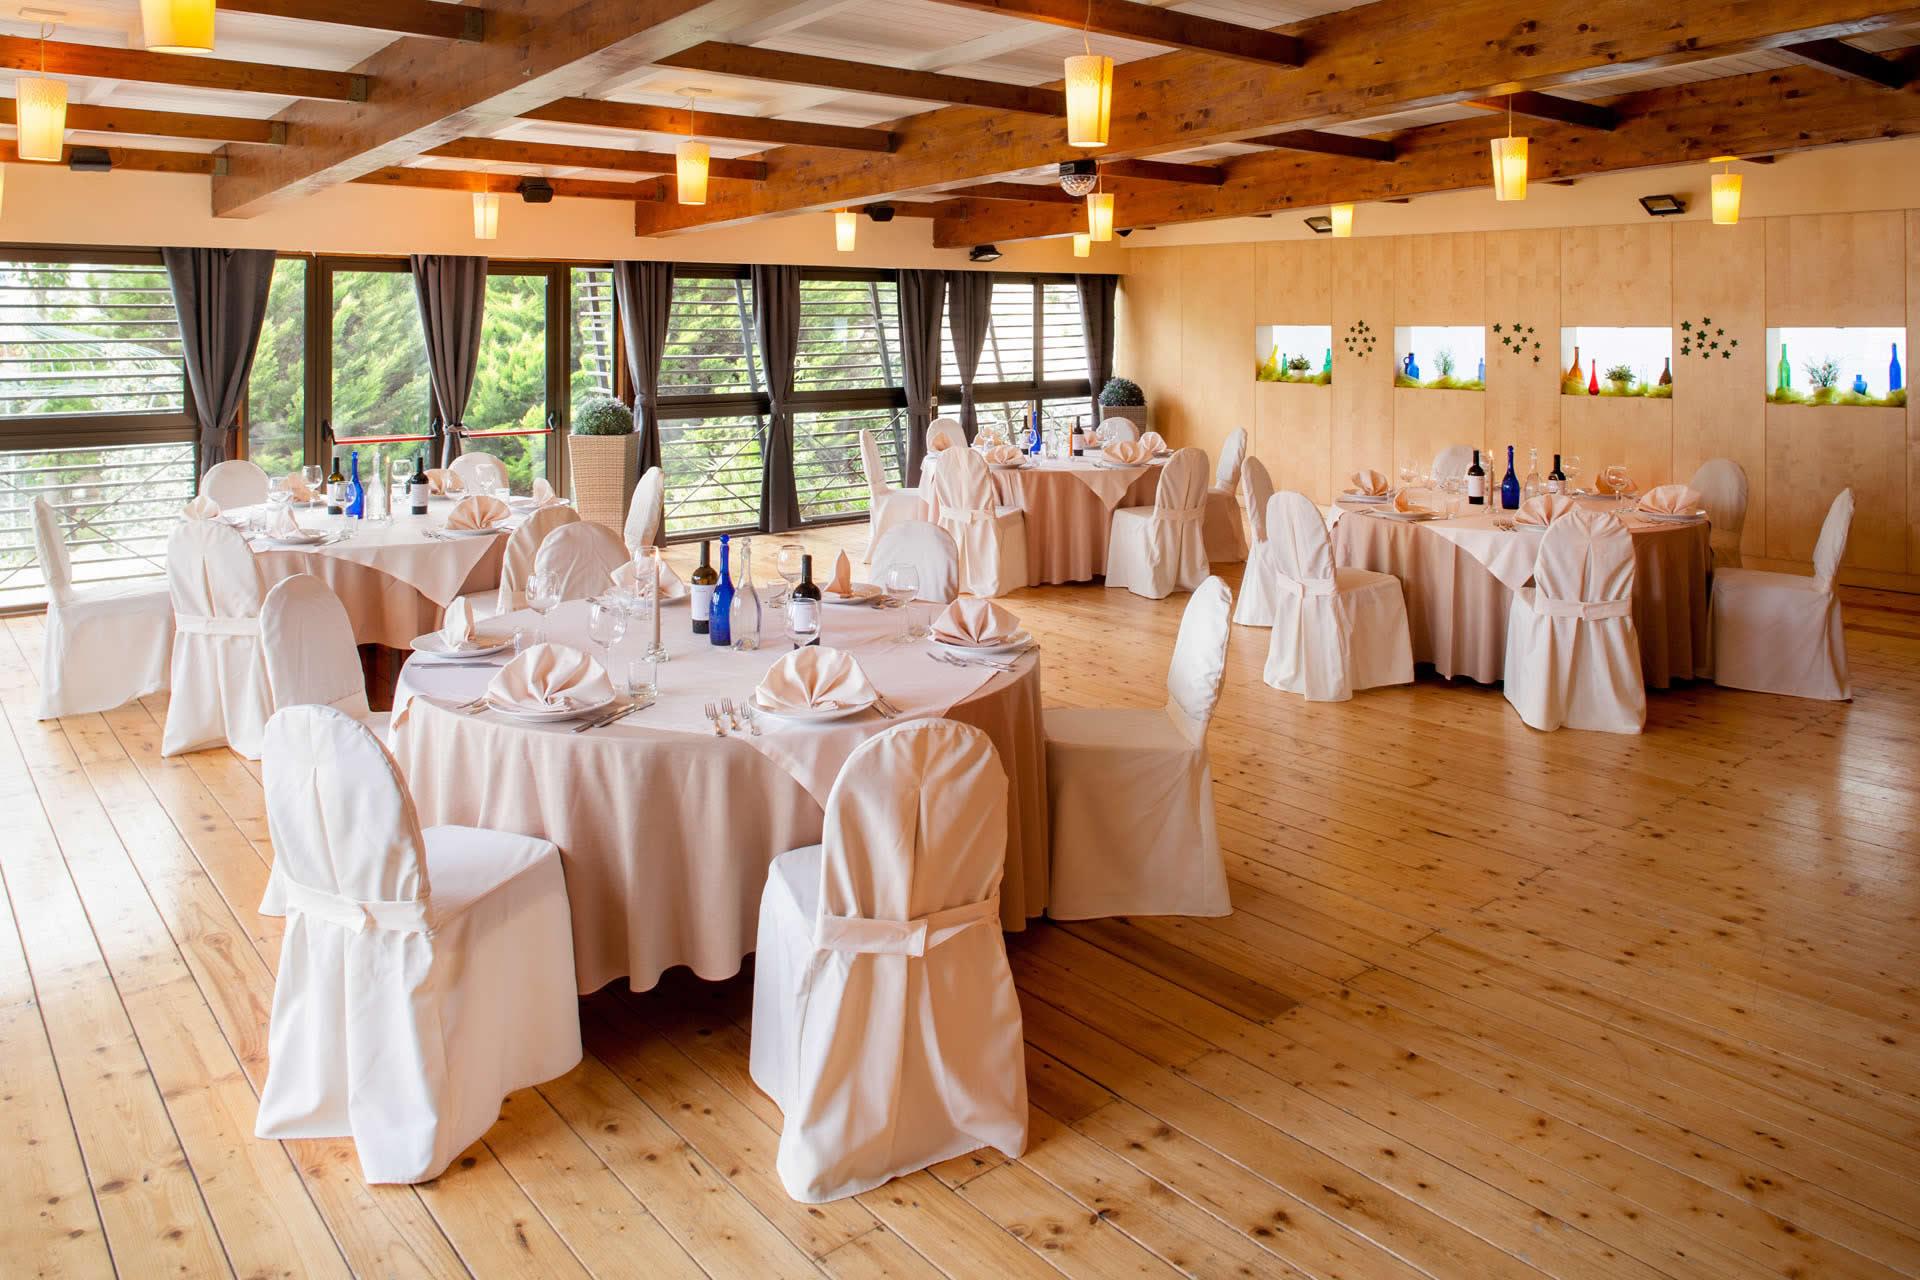 Ristorante hotel ostia antica cerimonie eeventi matrimonio for Interno 1 ostia